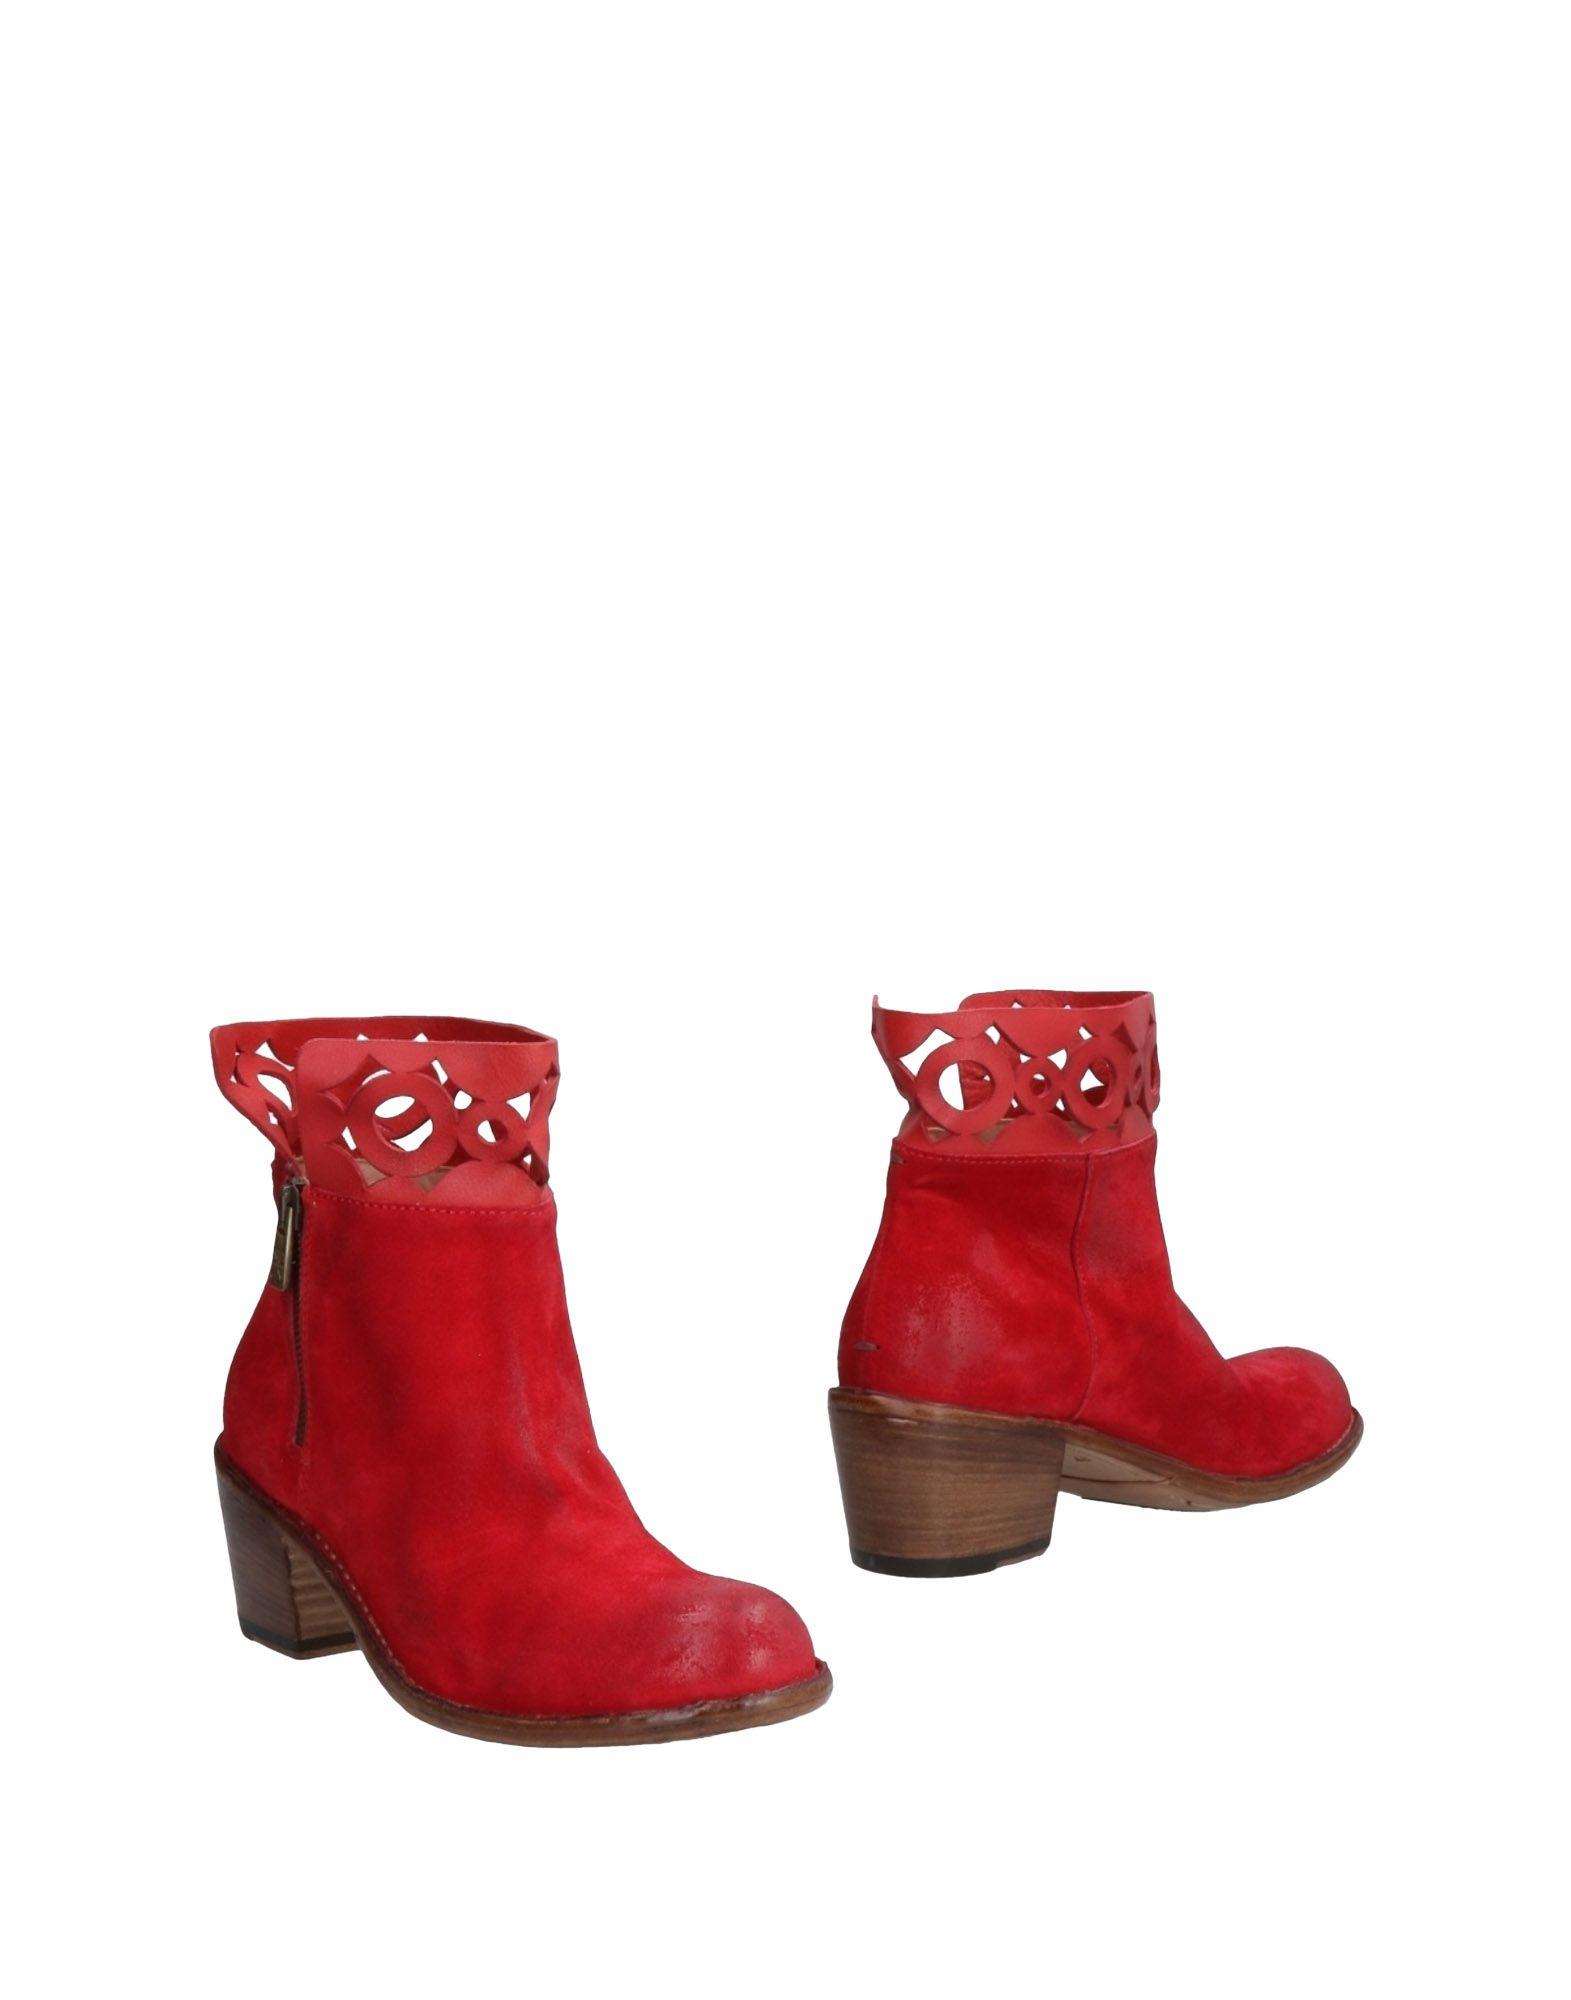 Pantanetti Stiefelette Damen  11468167JQGut aussehende strapazierfähige Schuhe